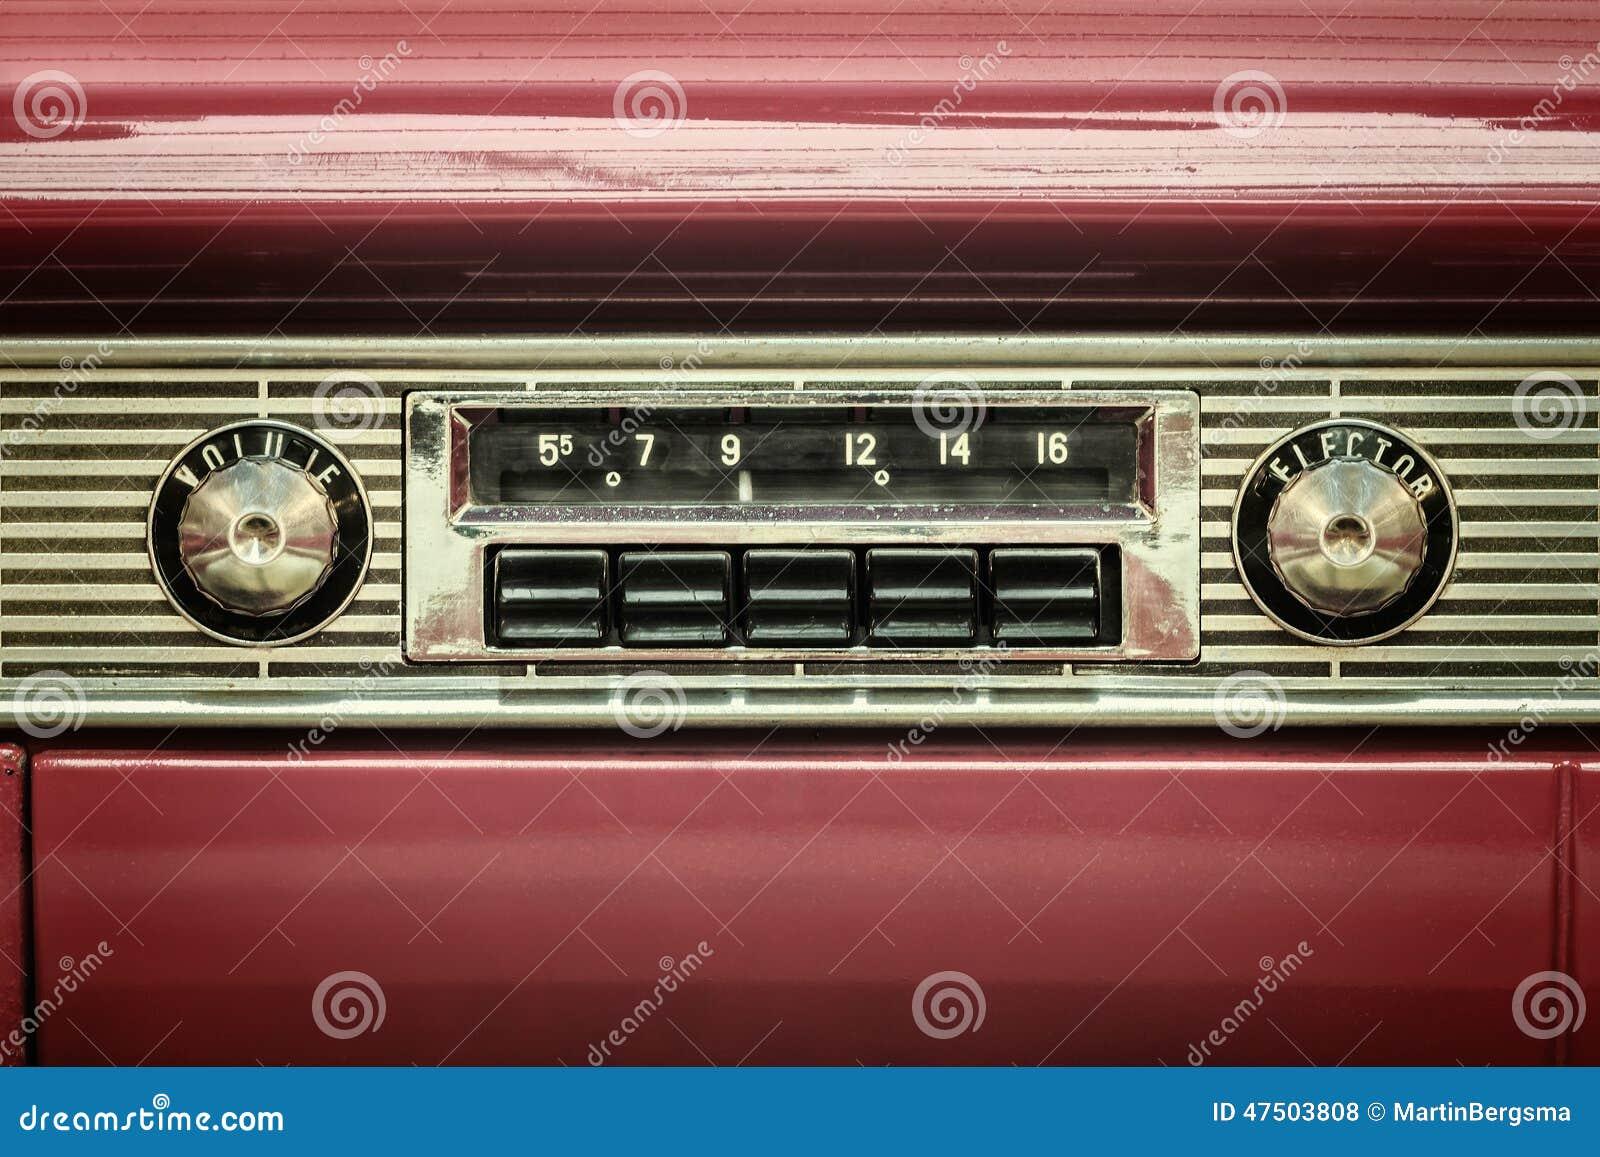 Old vintage automobile radios